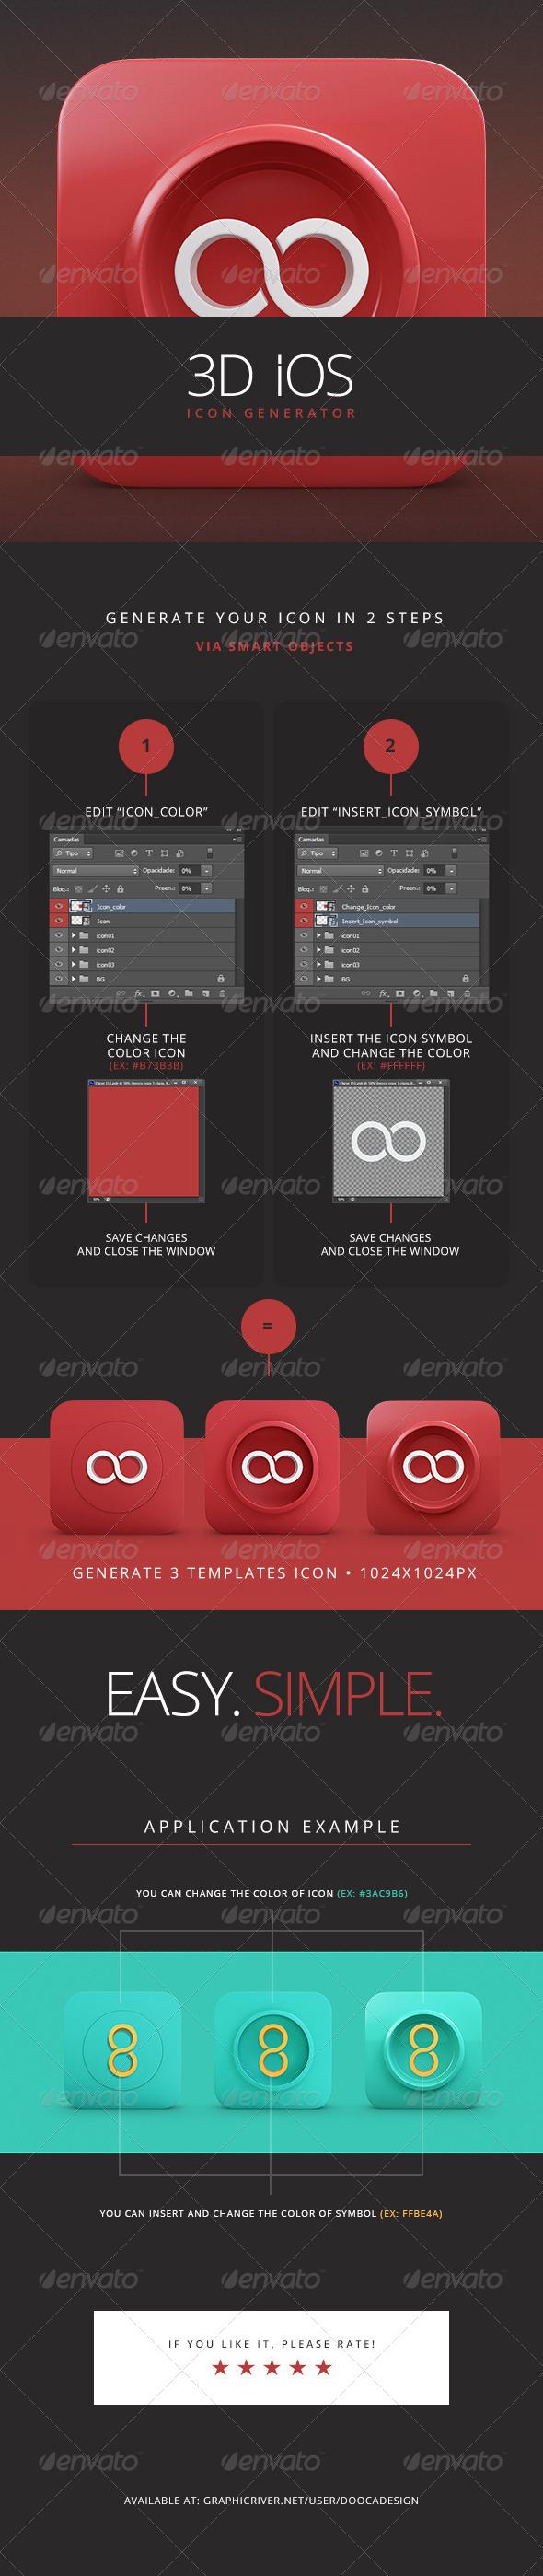 GraphicRiver 3D iOs Icon Generator 5033038